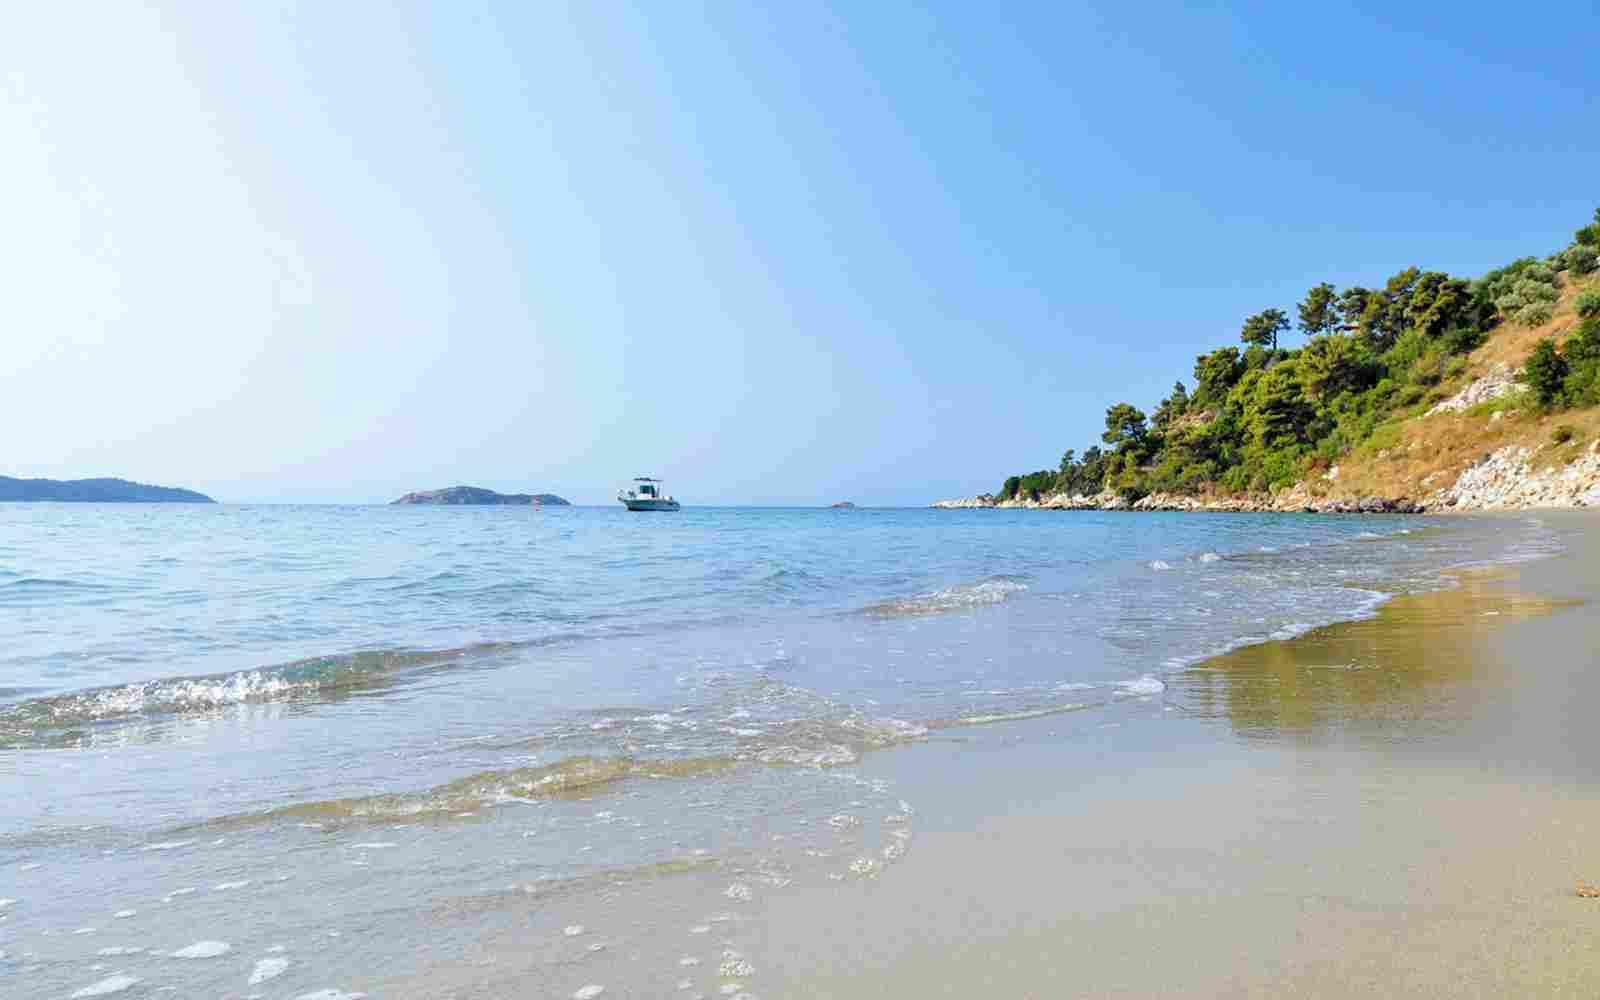 https://www.okohotel.co.nz/wp-content/uploads/2016/03/summer-beach-01.jpg